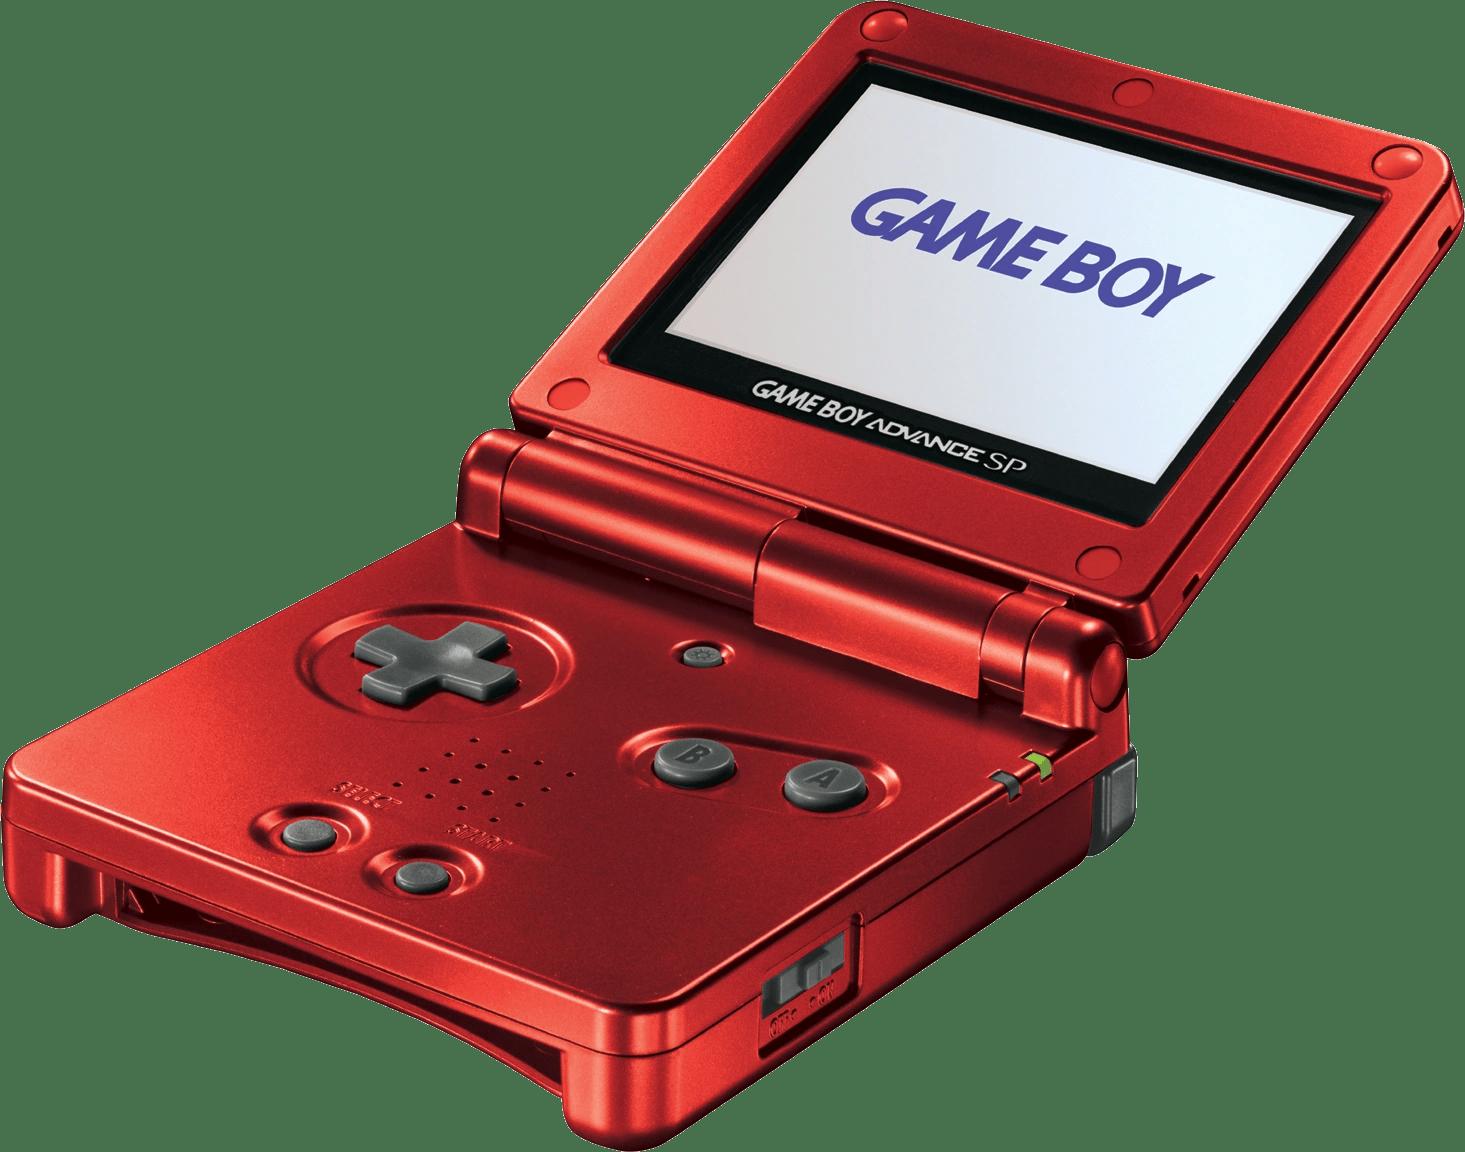 Game Boy Advance SP The Nintendo Wiki Wii Nintendo DS